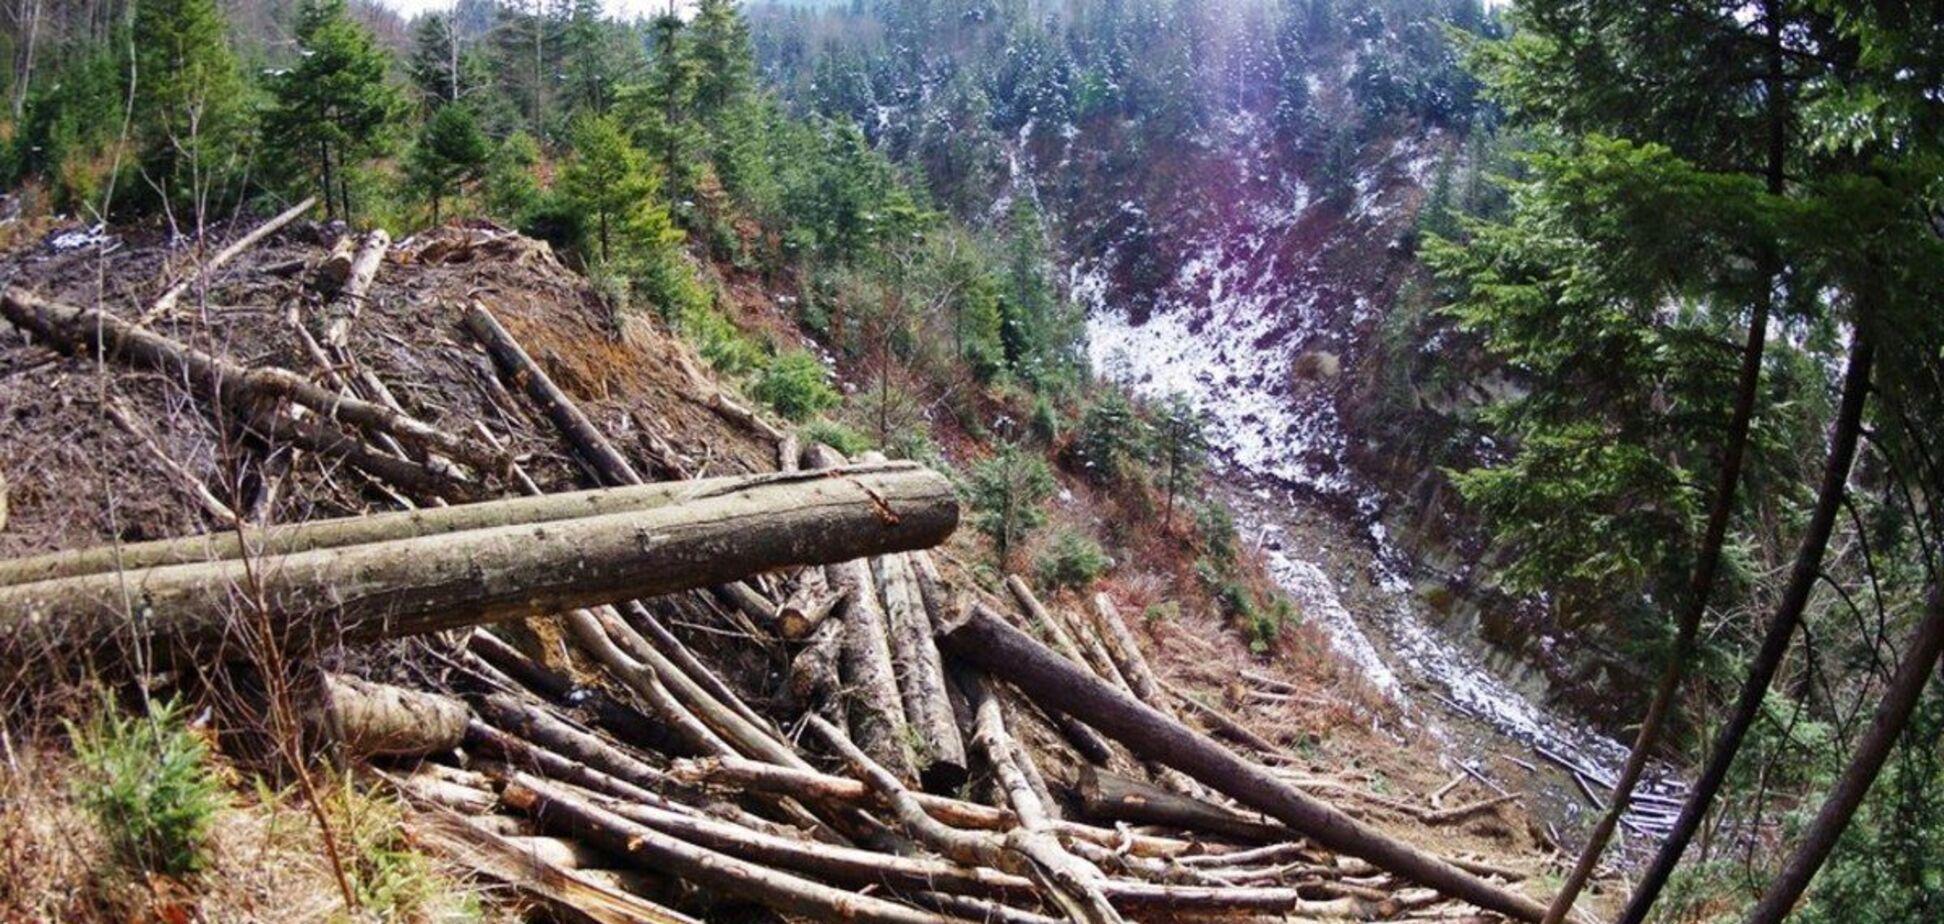 Президента Зеленського попросили зупинити екологічну катастрофу в Карпатах